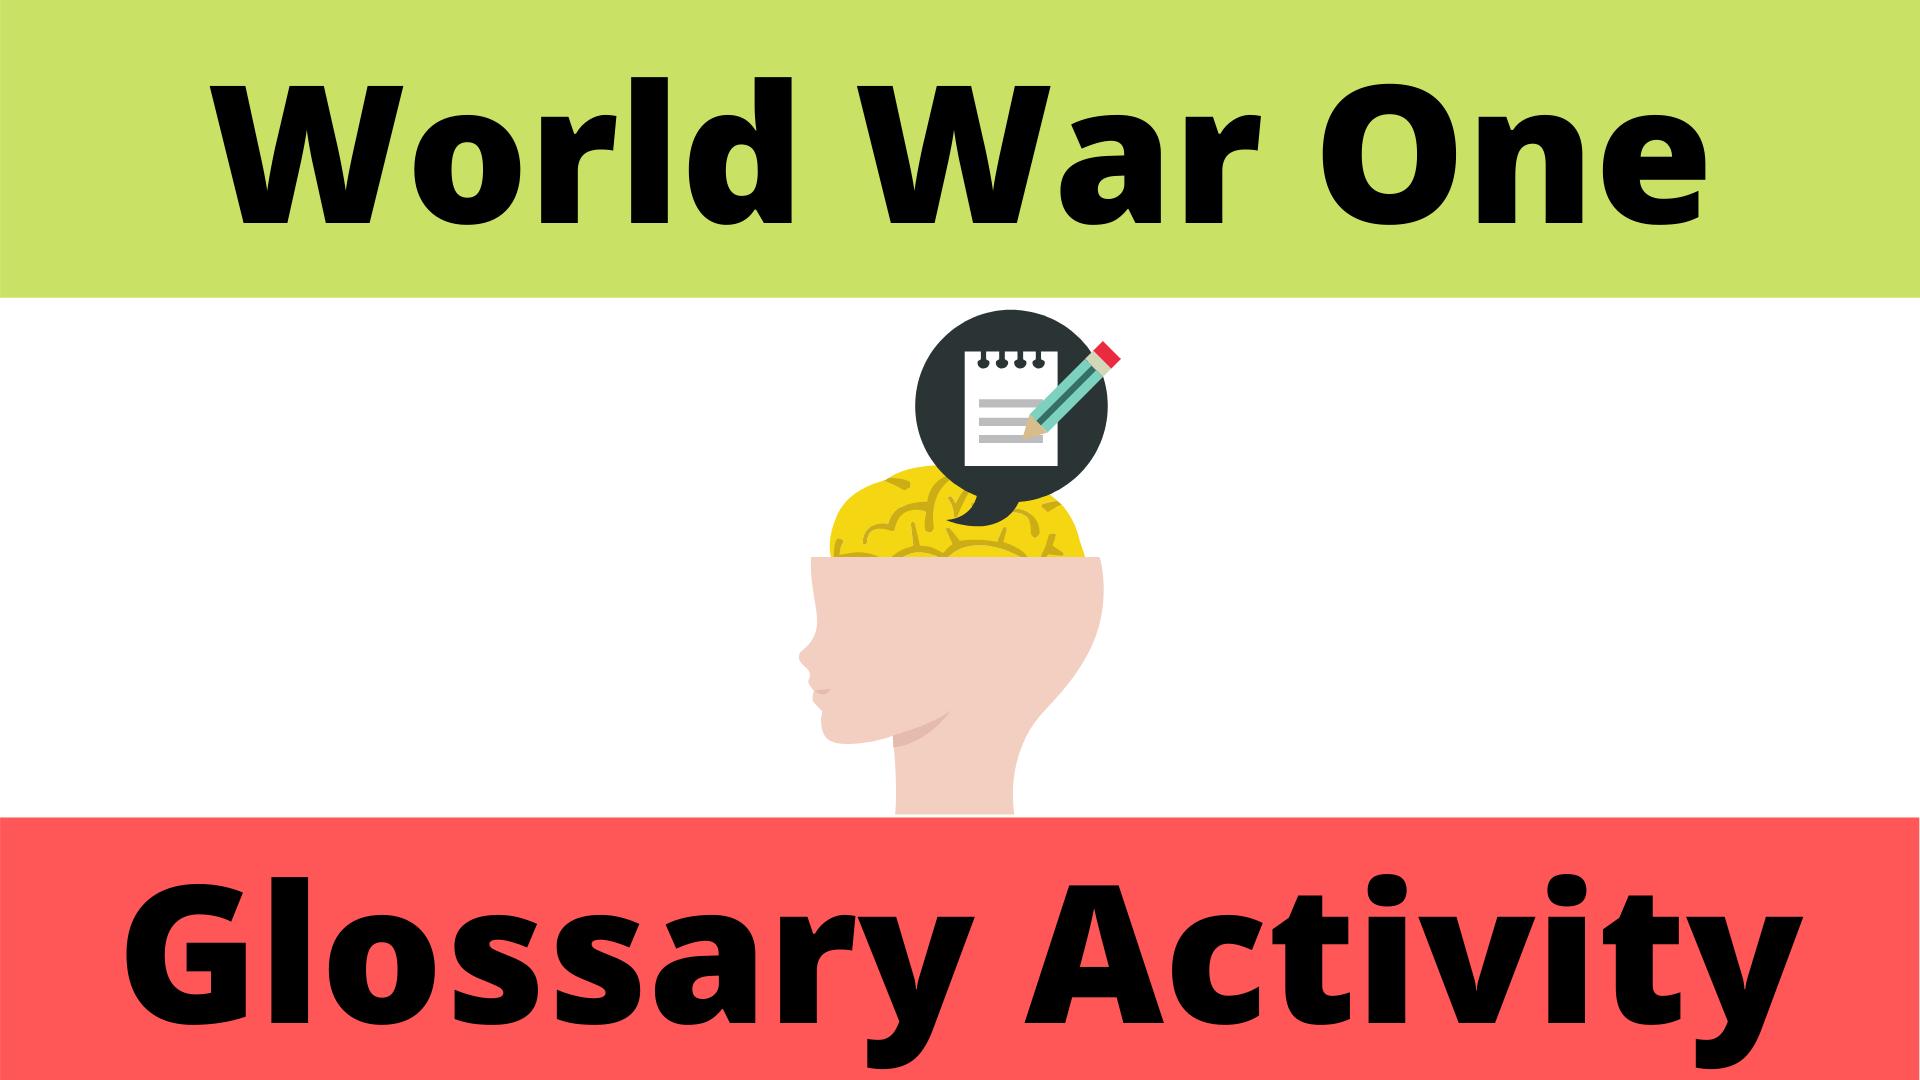 World War One Glossary Activity